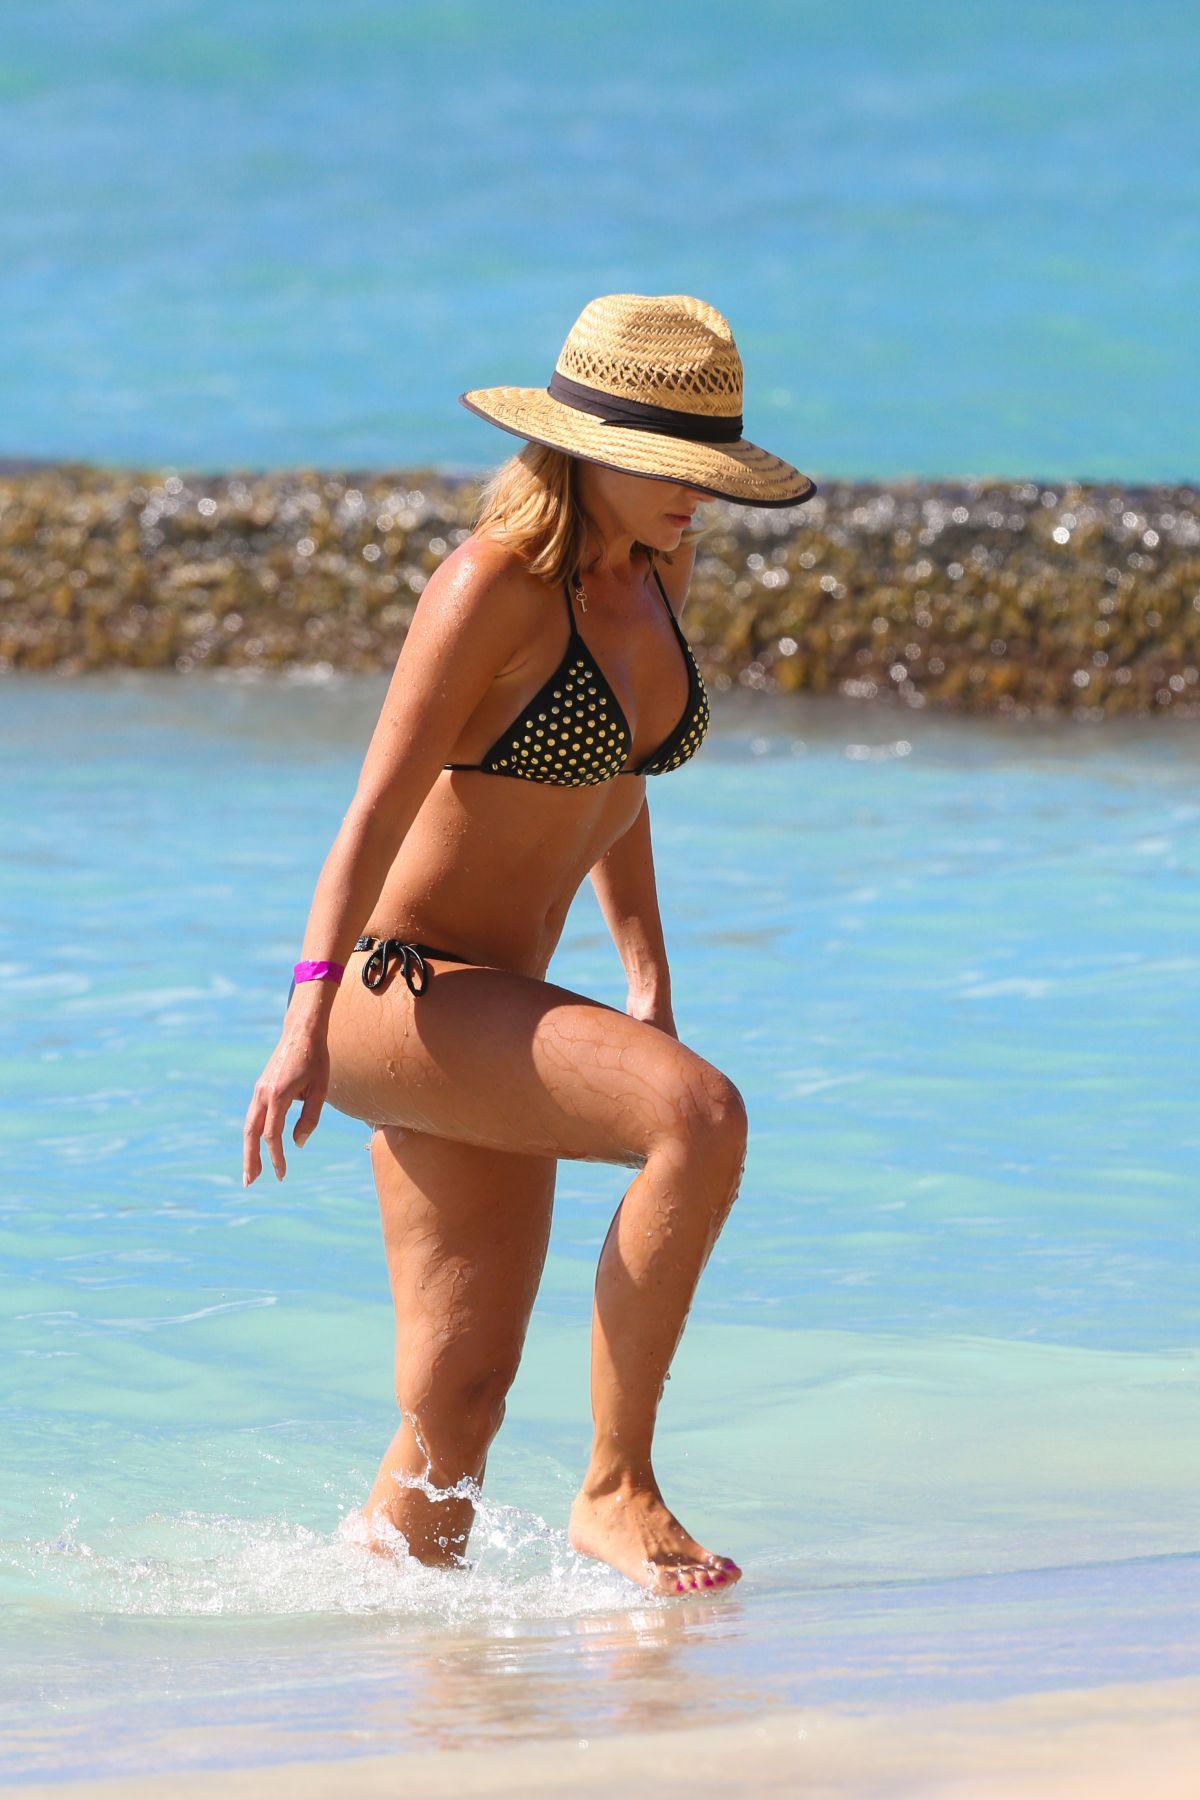 Bikini julie benz 39 Hottest